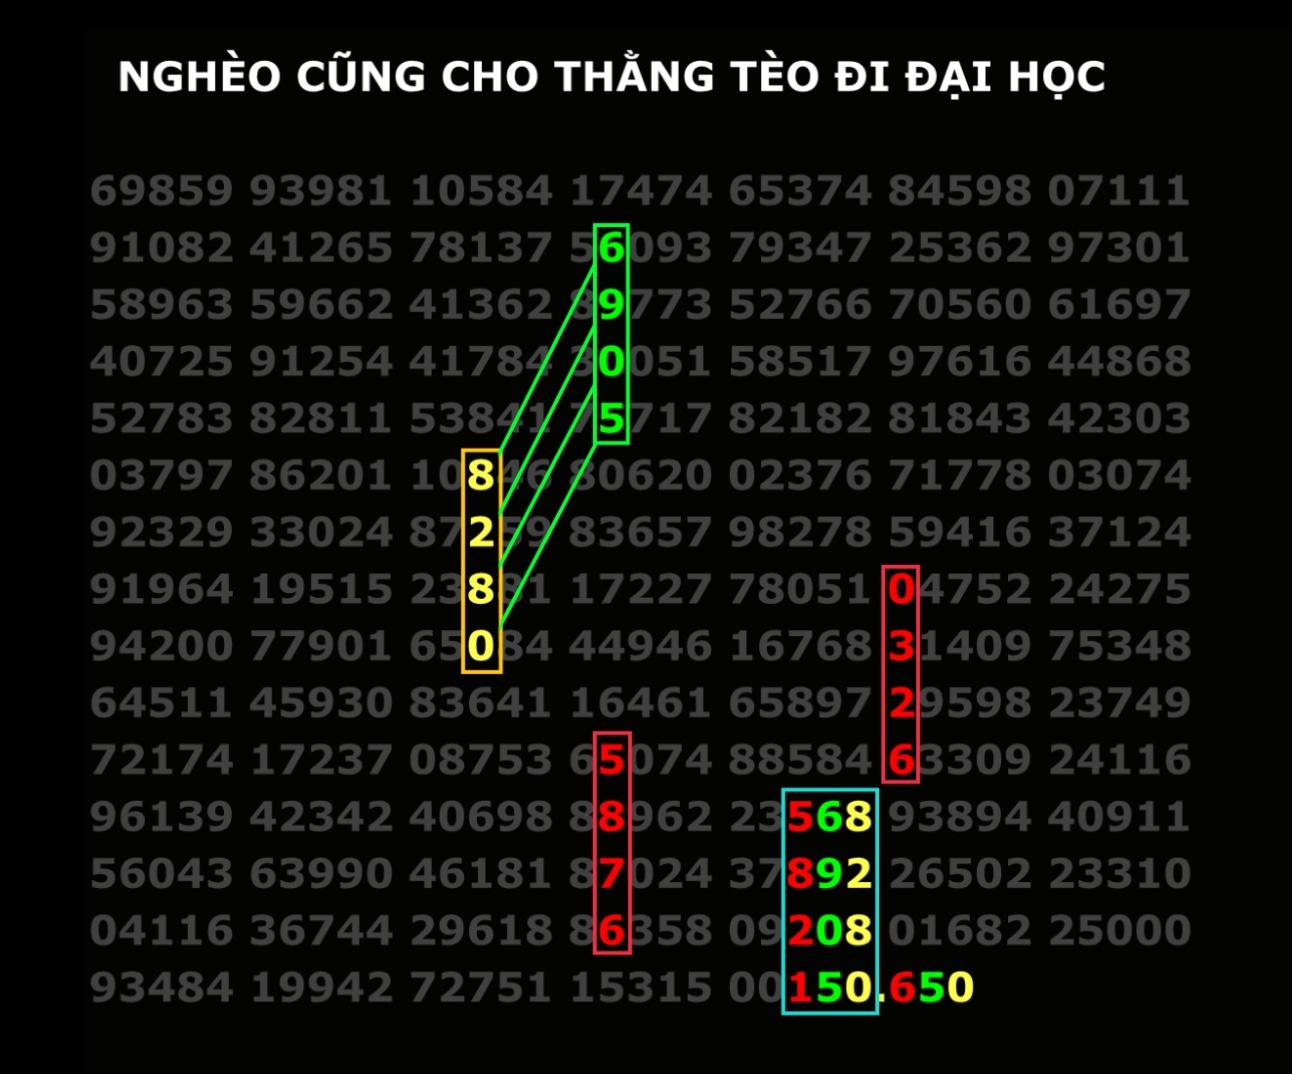 CABC2EFD-585C-47D7-80F7-78E74597FBA9.jpeg